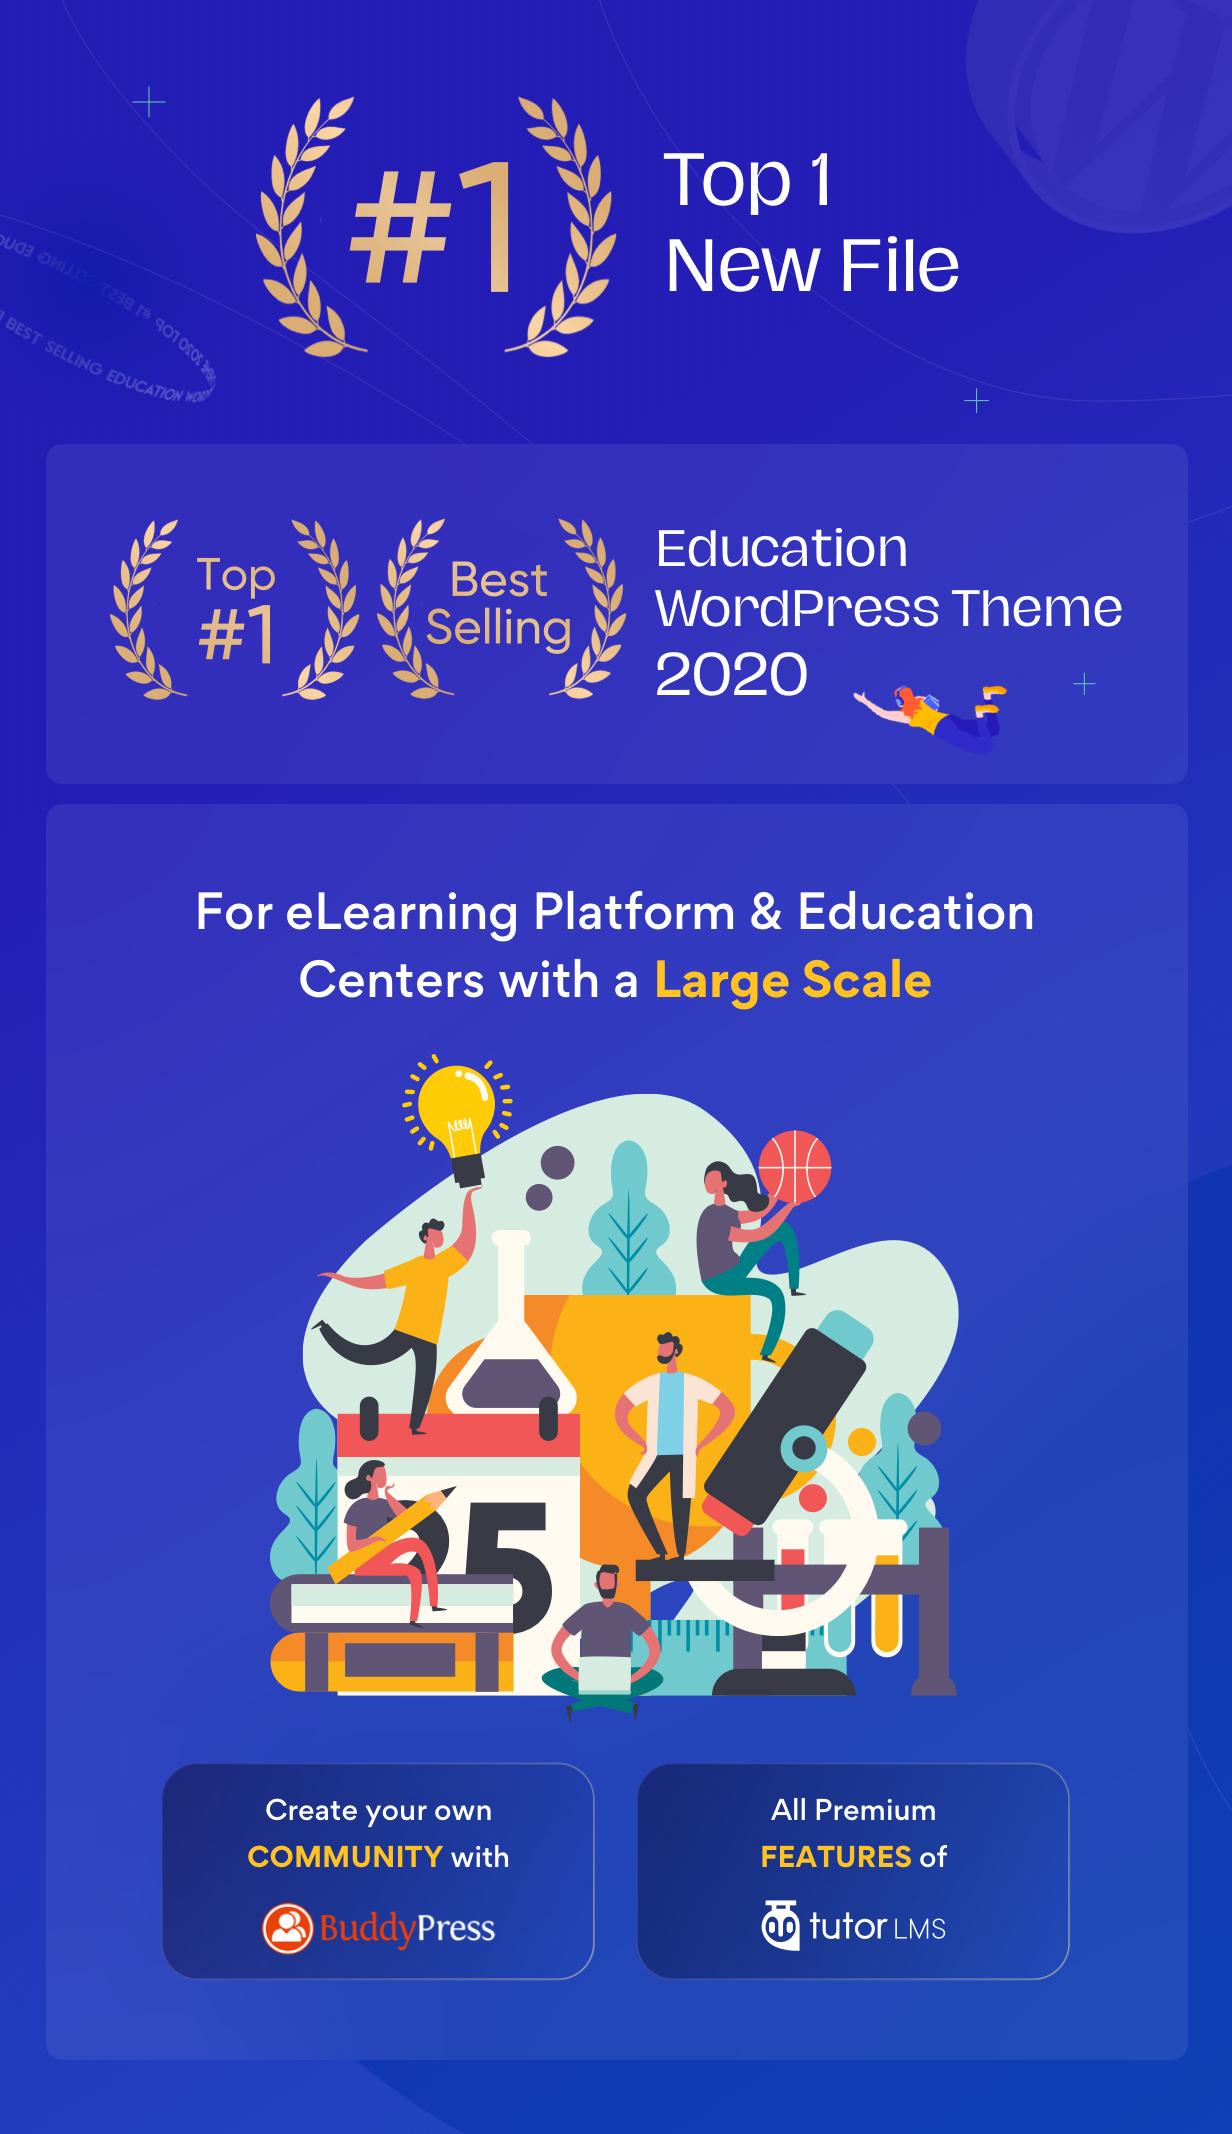 EduMall - Professional LMS Education Center WordPress Theme - 1